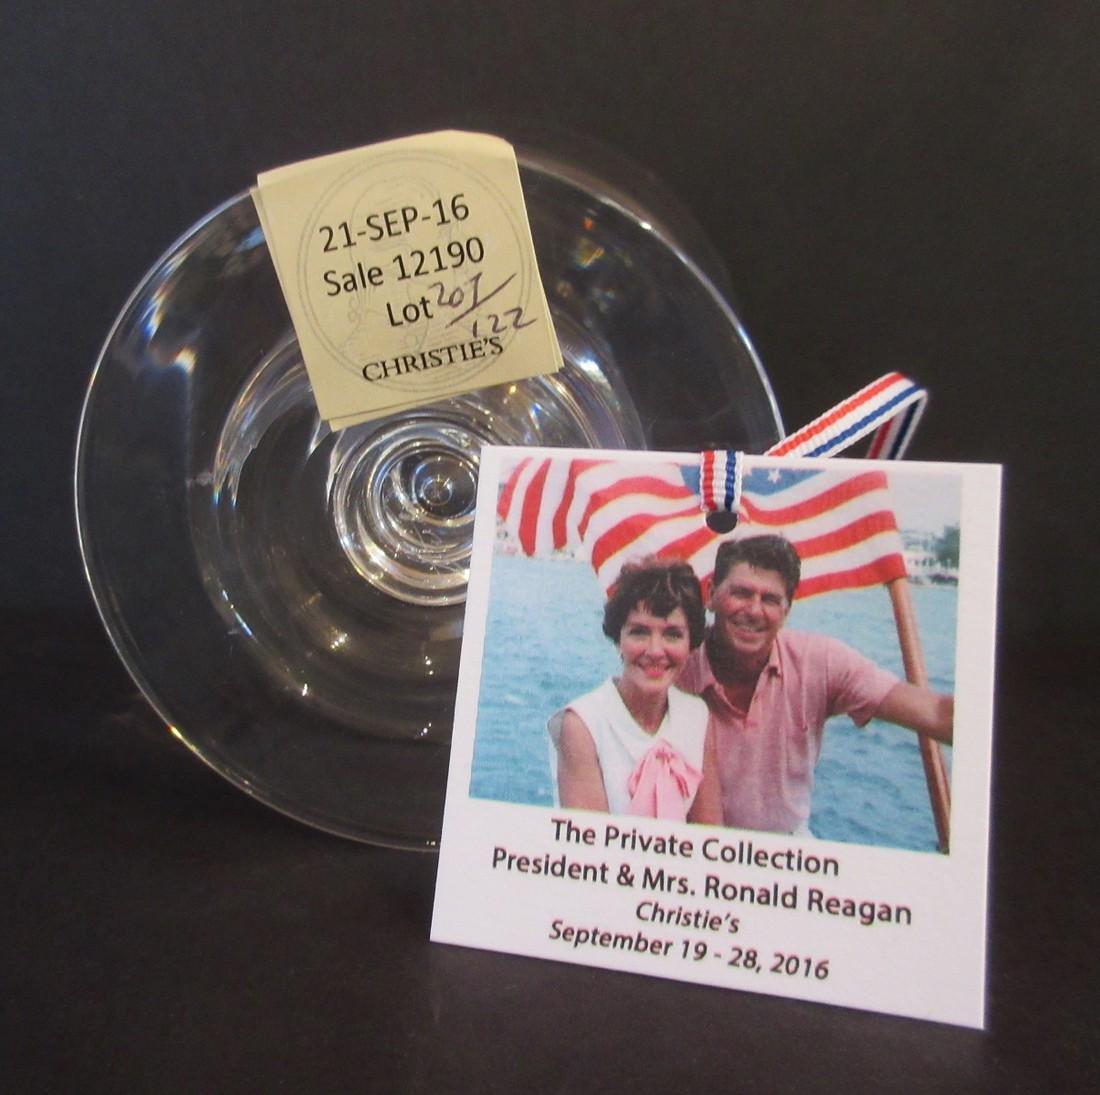 Ronald Reagan Steuben Glass Works Dessert Coupe - 4